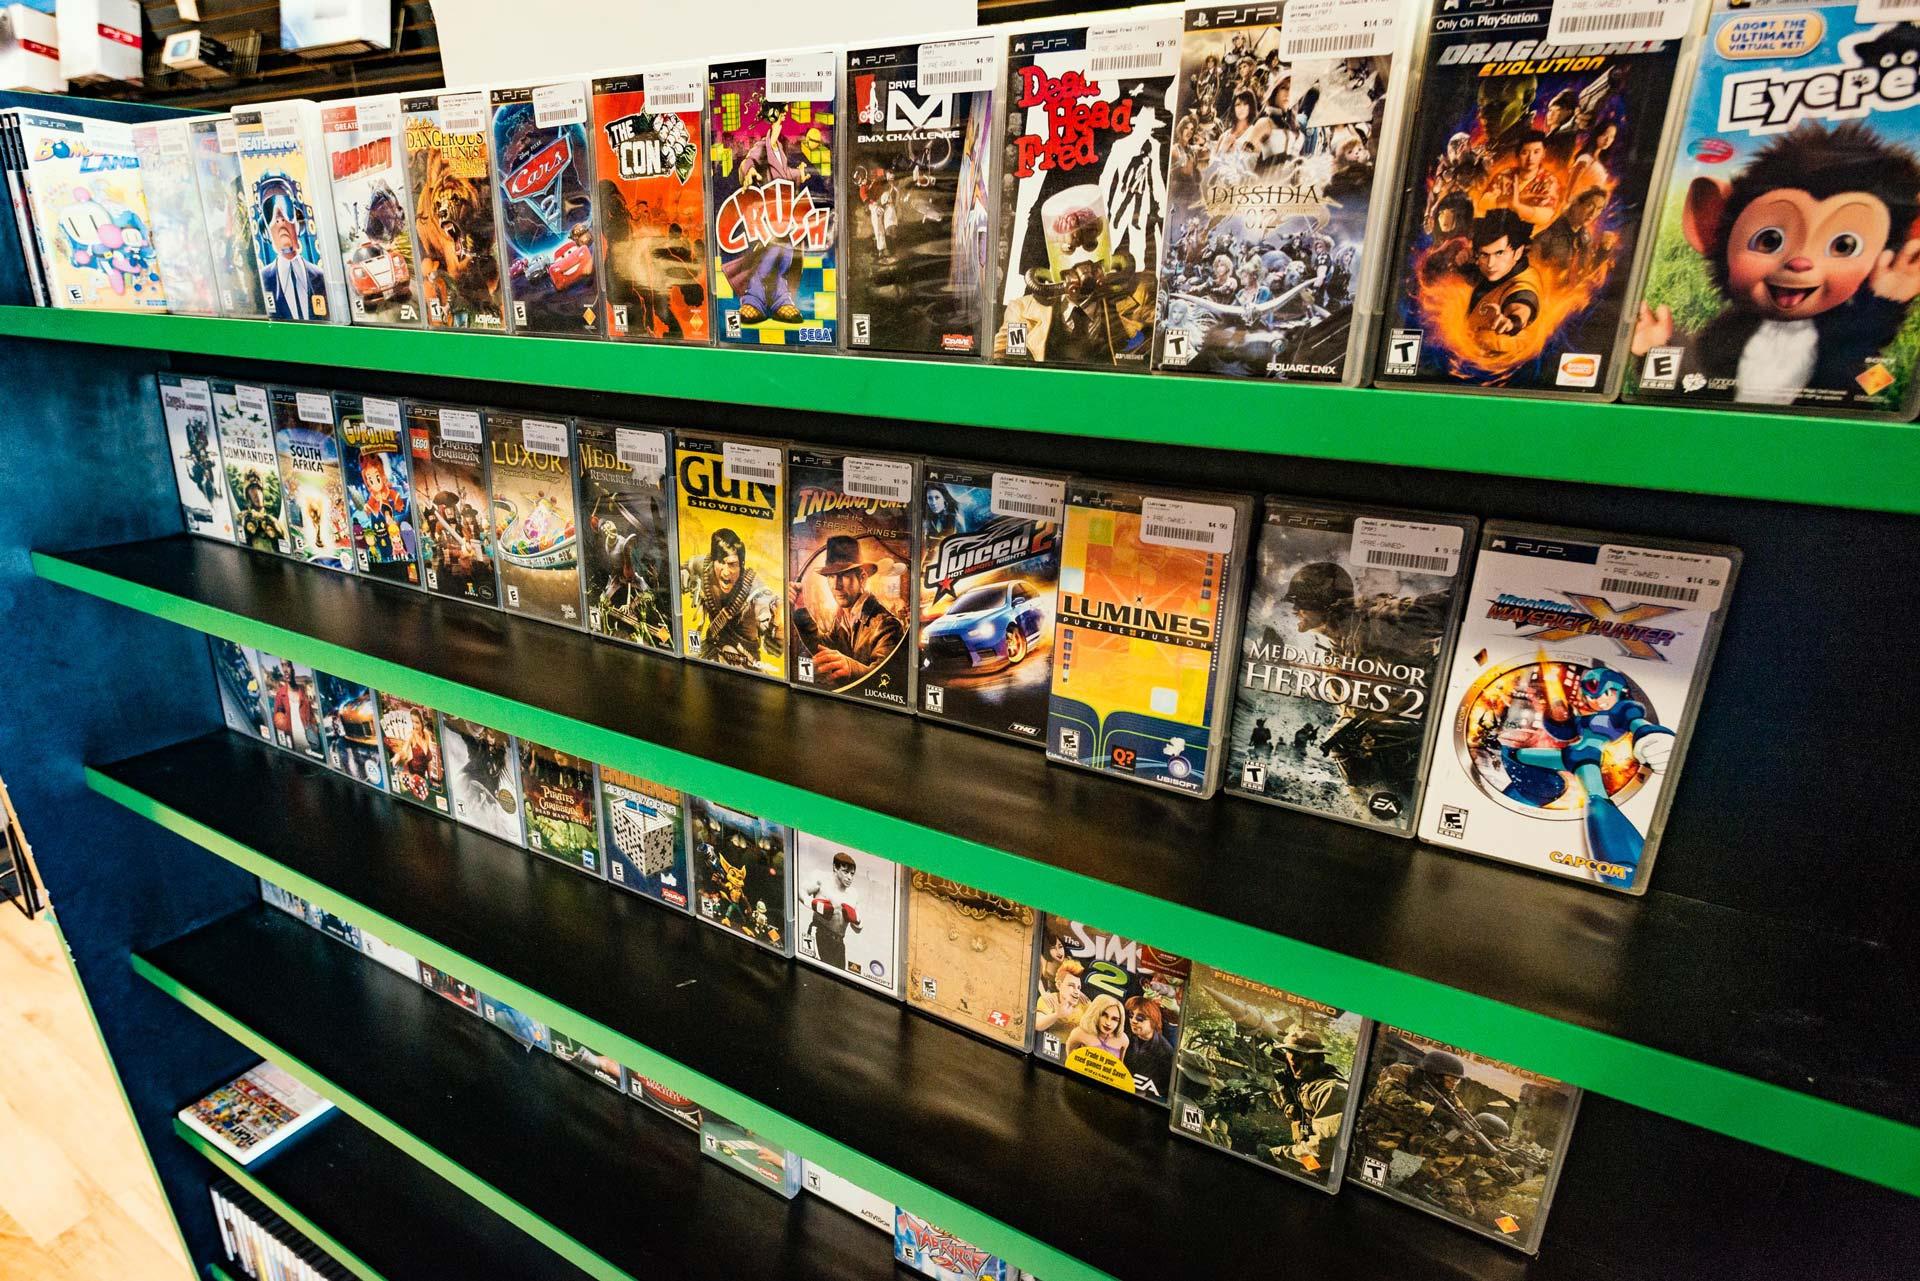 Ready set game video game display